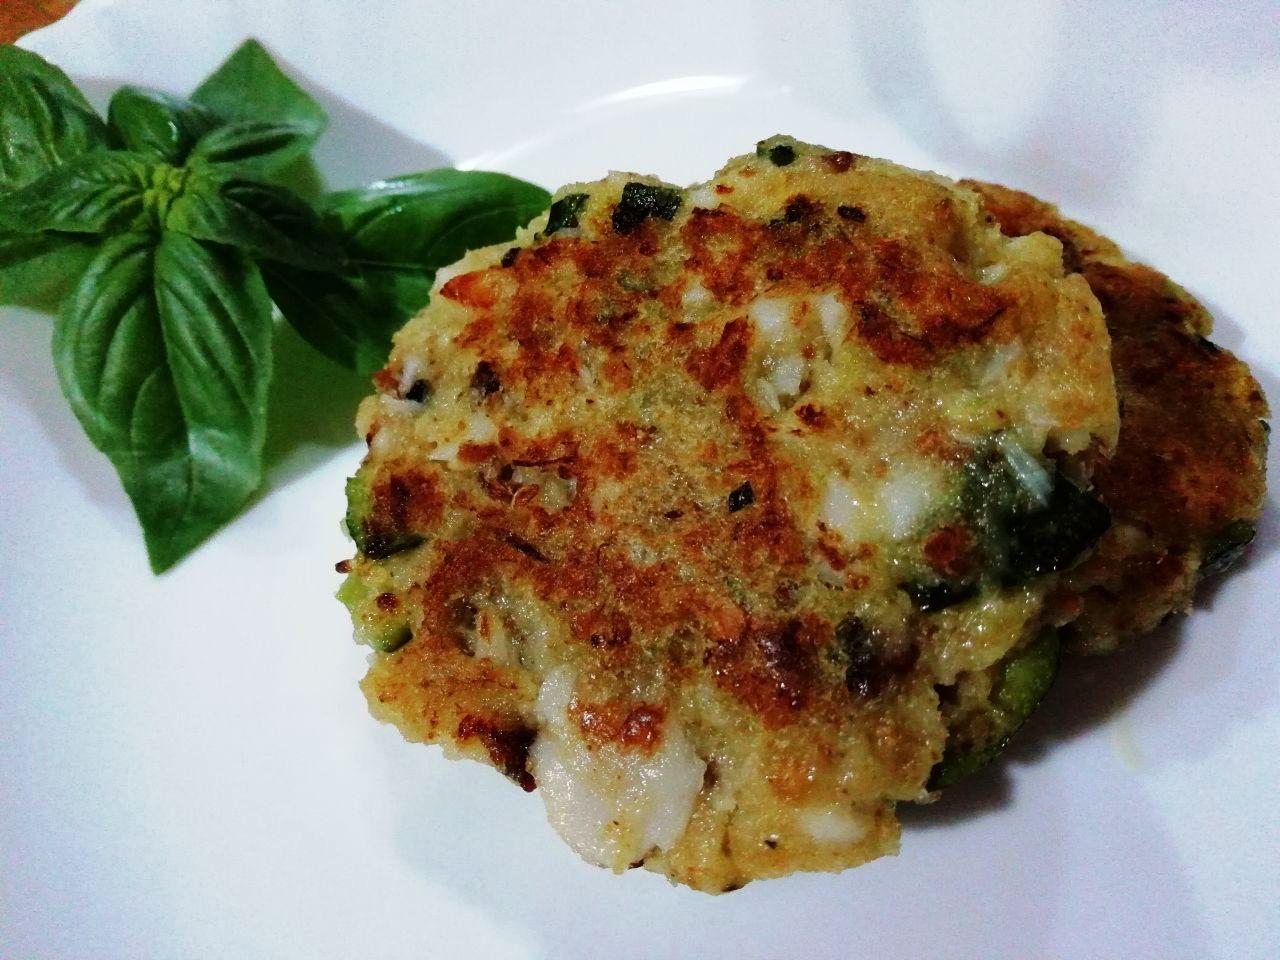 Antipasti a base di pesce: schiacciatine di merluzzo in padella!